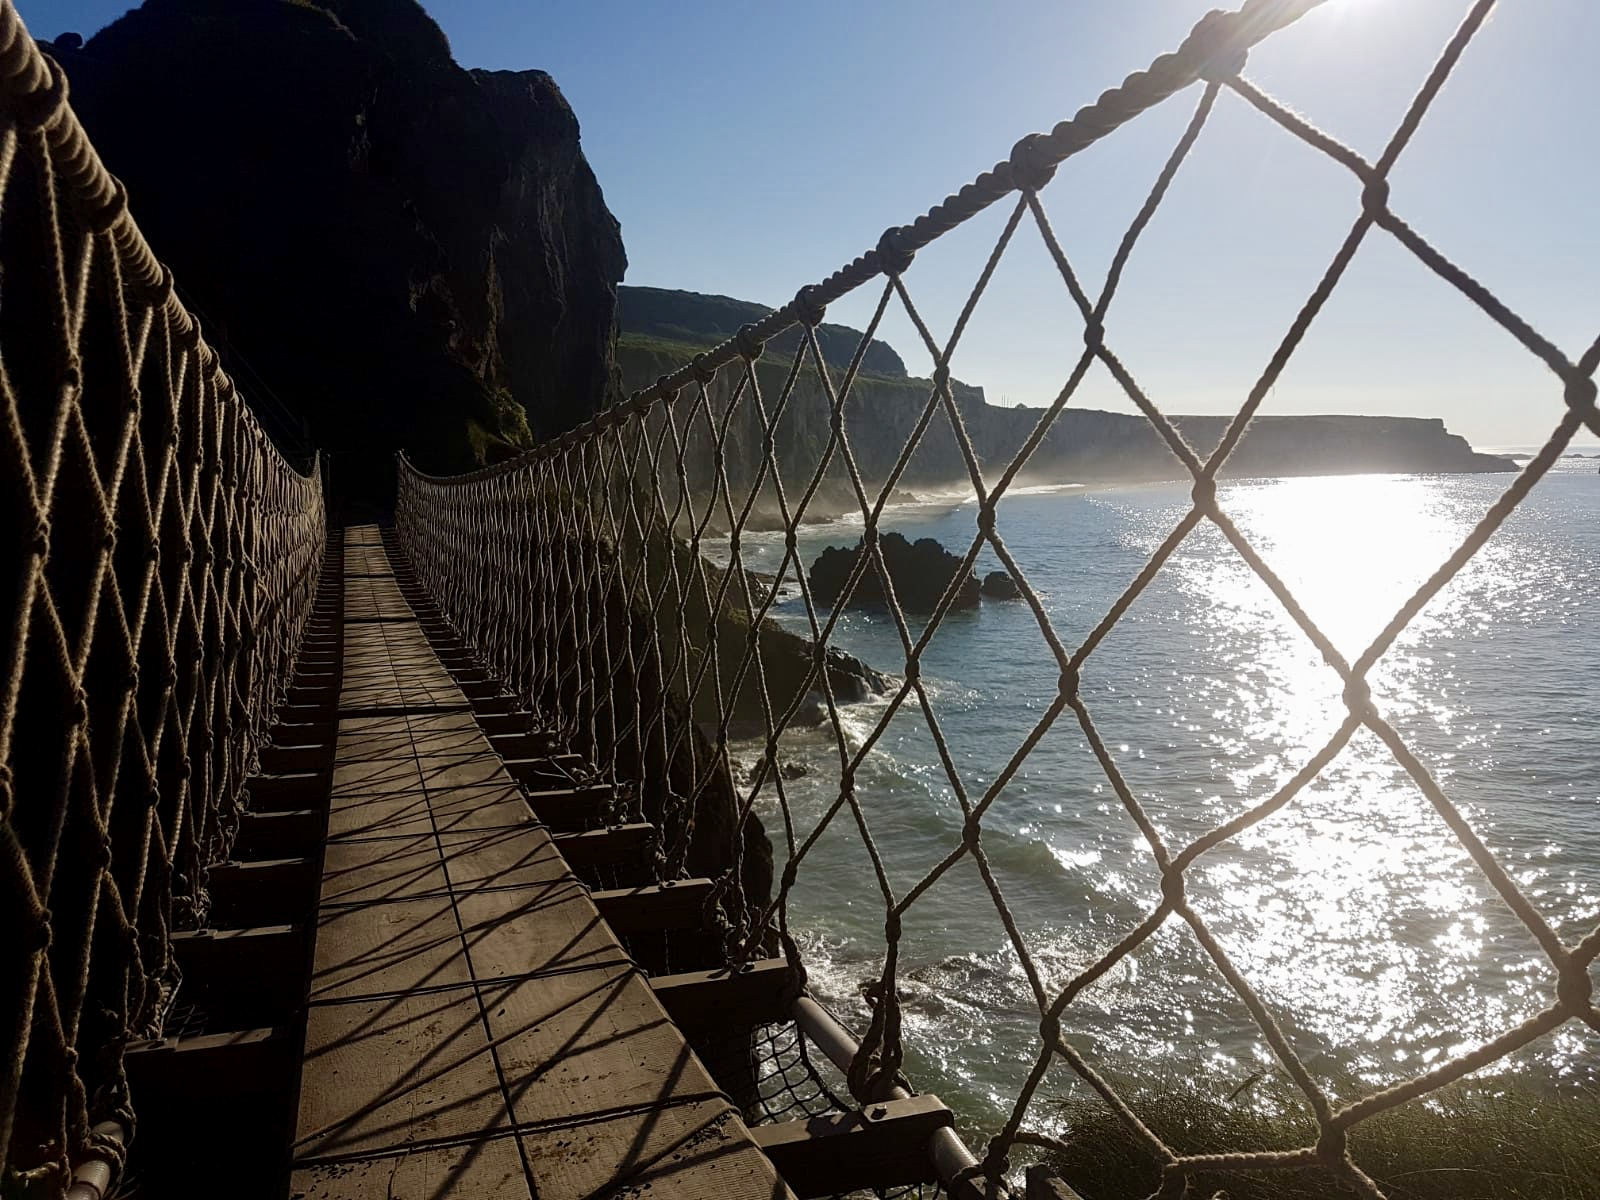 carrick-a-rede-rope-bridge-sup-paddle-board-causeway-coast (1).jpeg